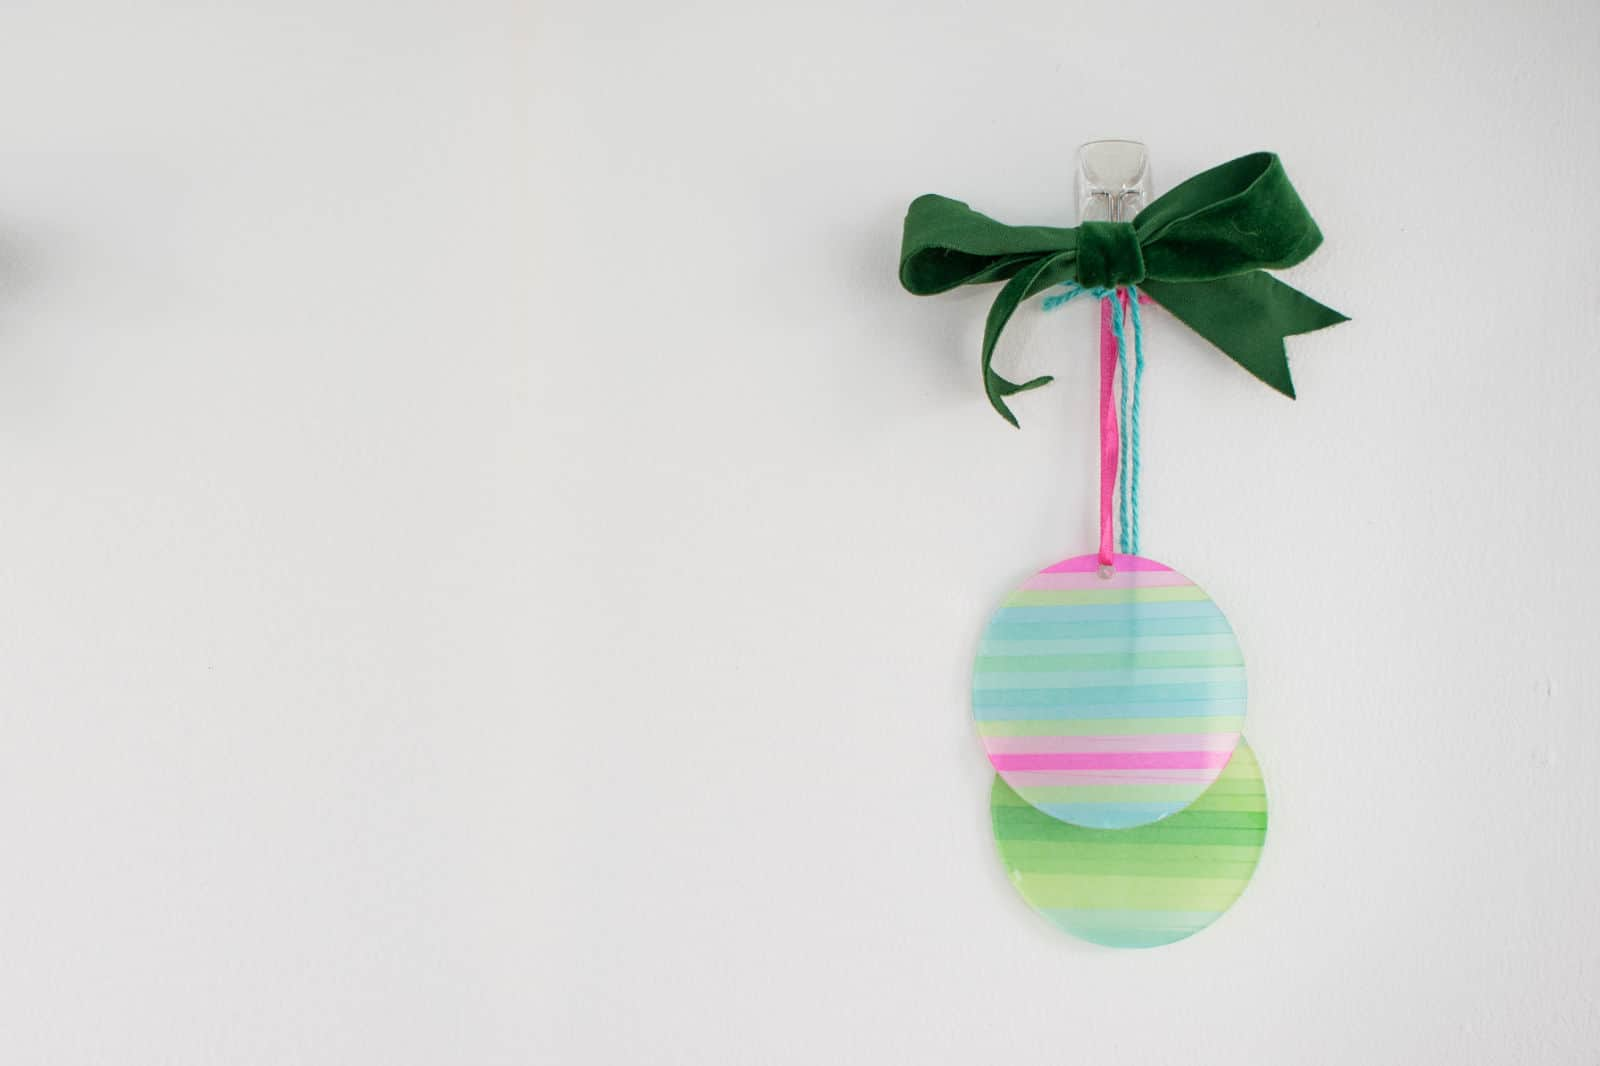 ACrylic washi tape ornament